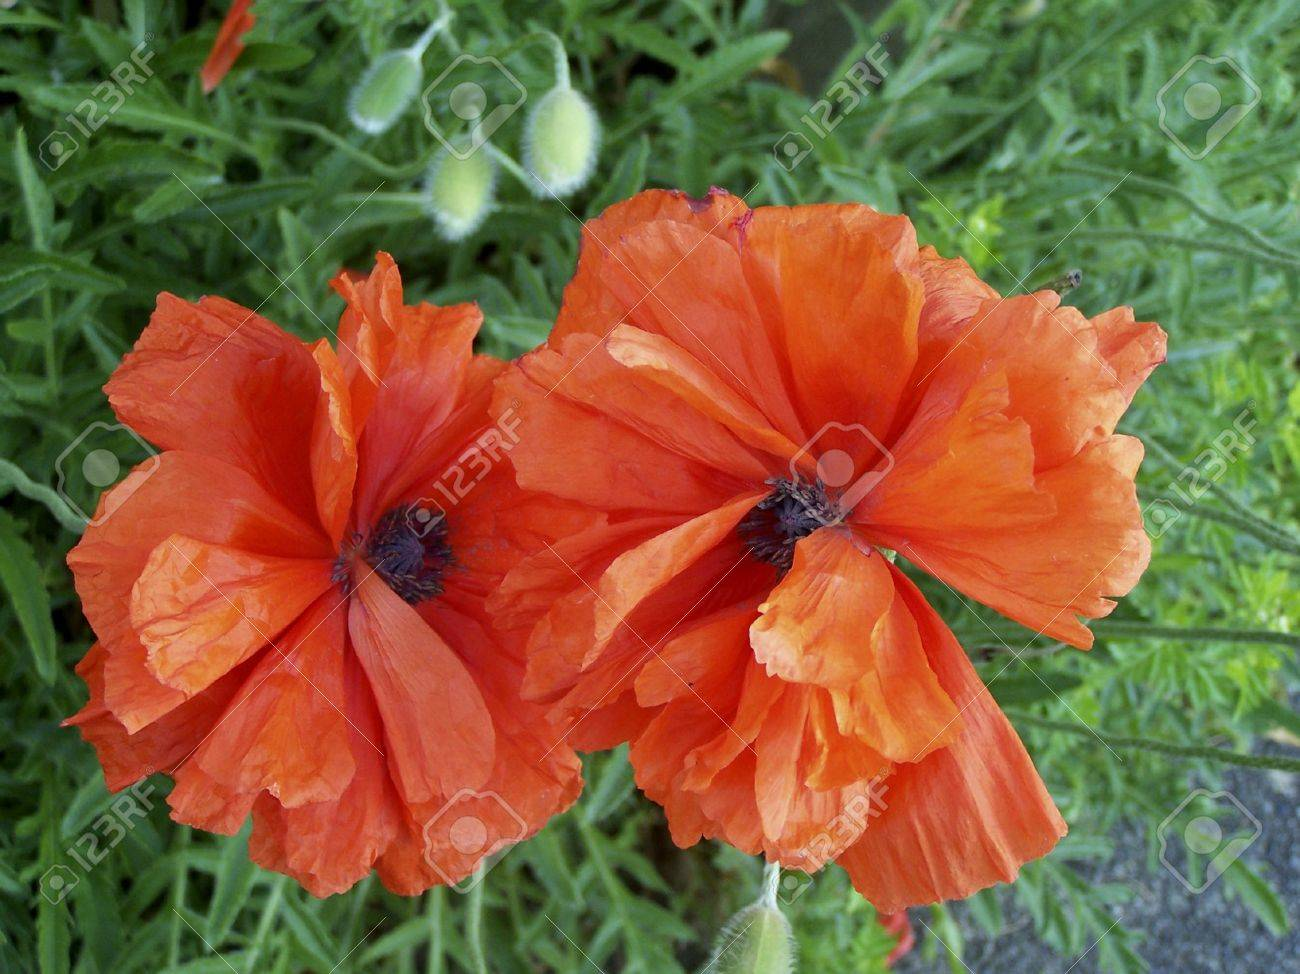 Orange Poppy Flowers On Vancouver Island Bc Canada By Skye Stock